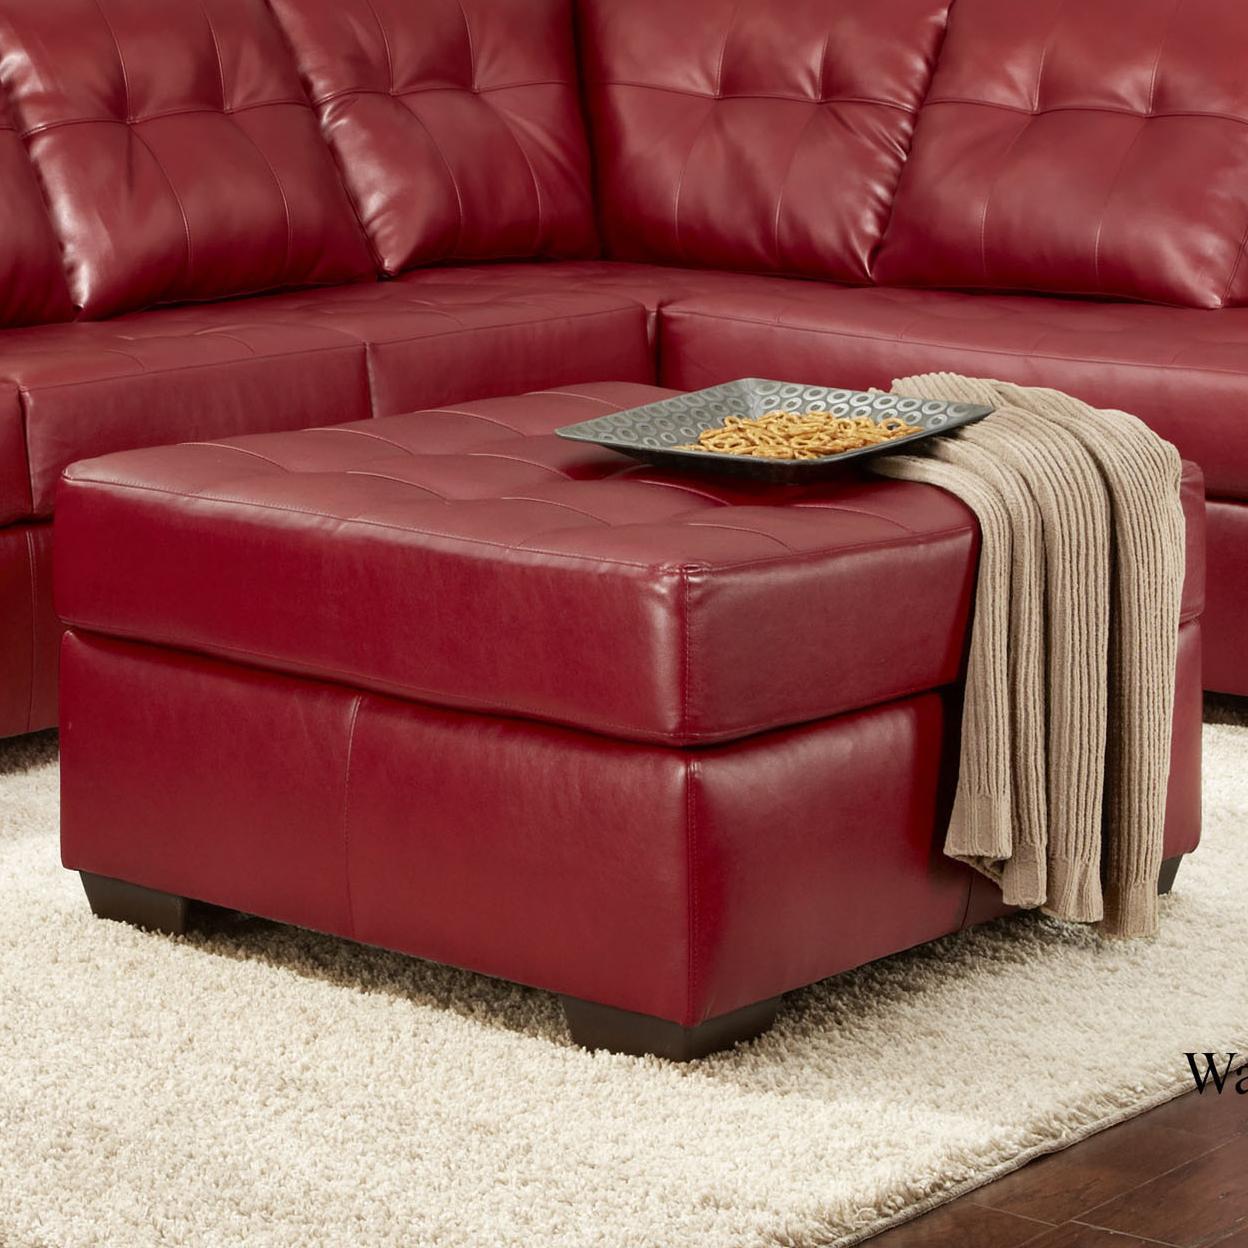 2400 Ottoman by Washington Furniture at Lynn's Furniture & Mattress